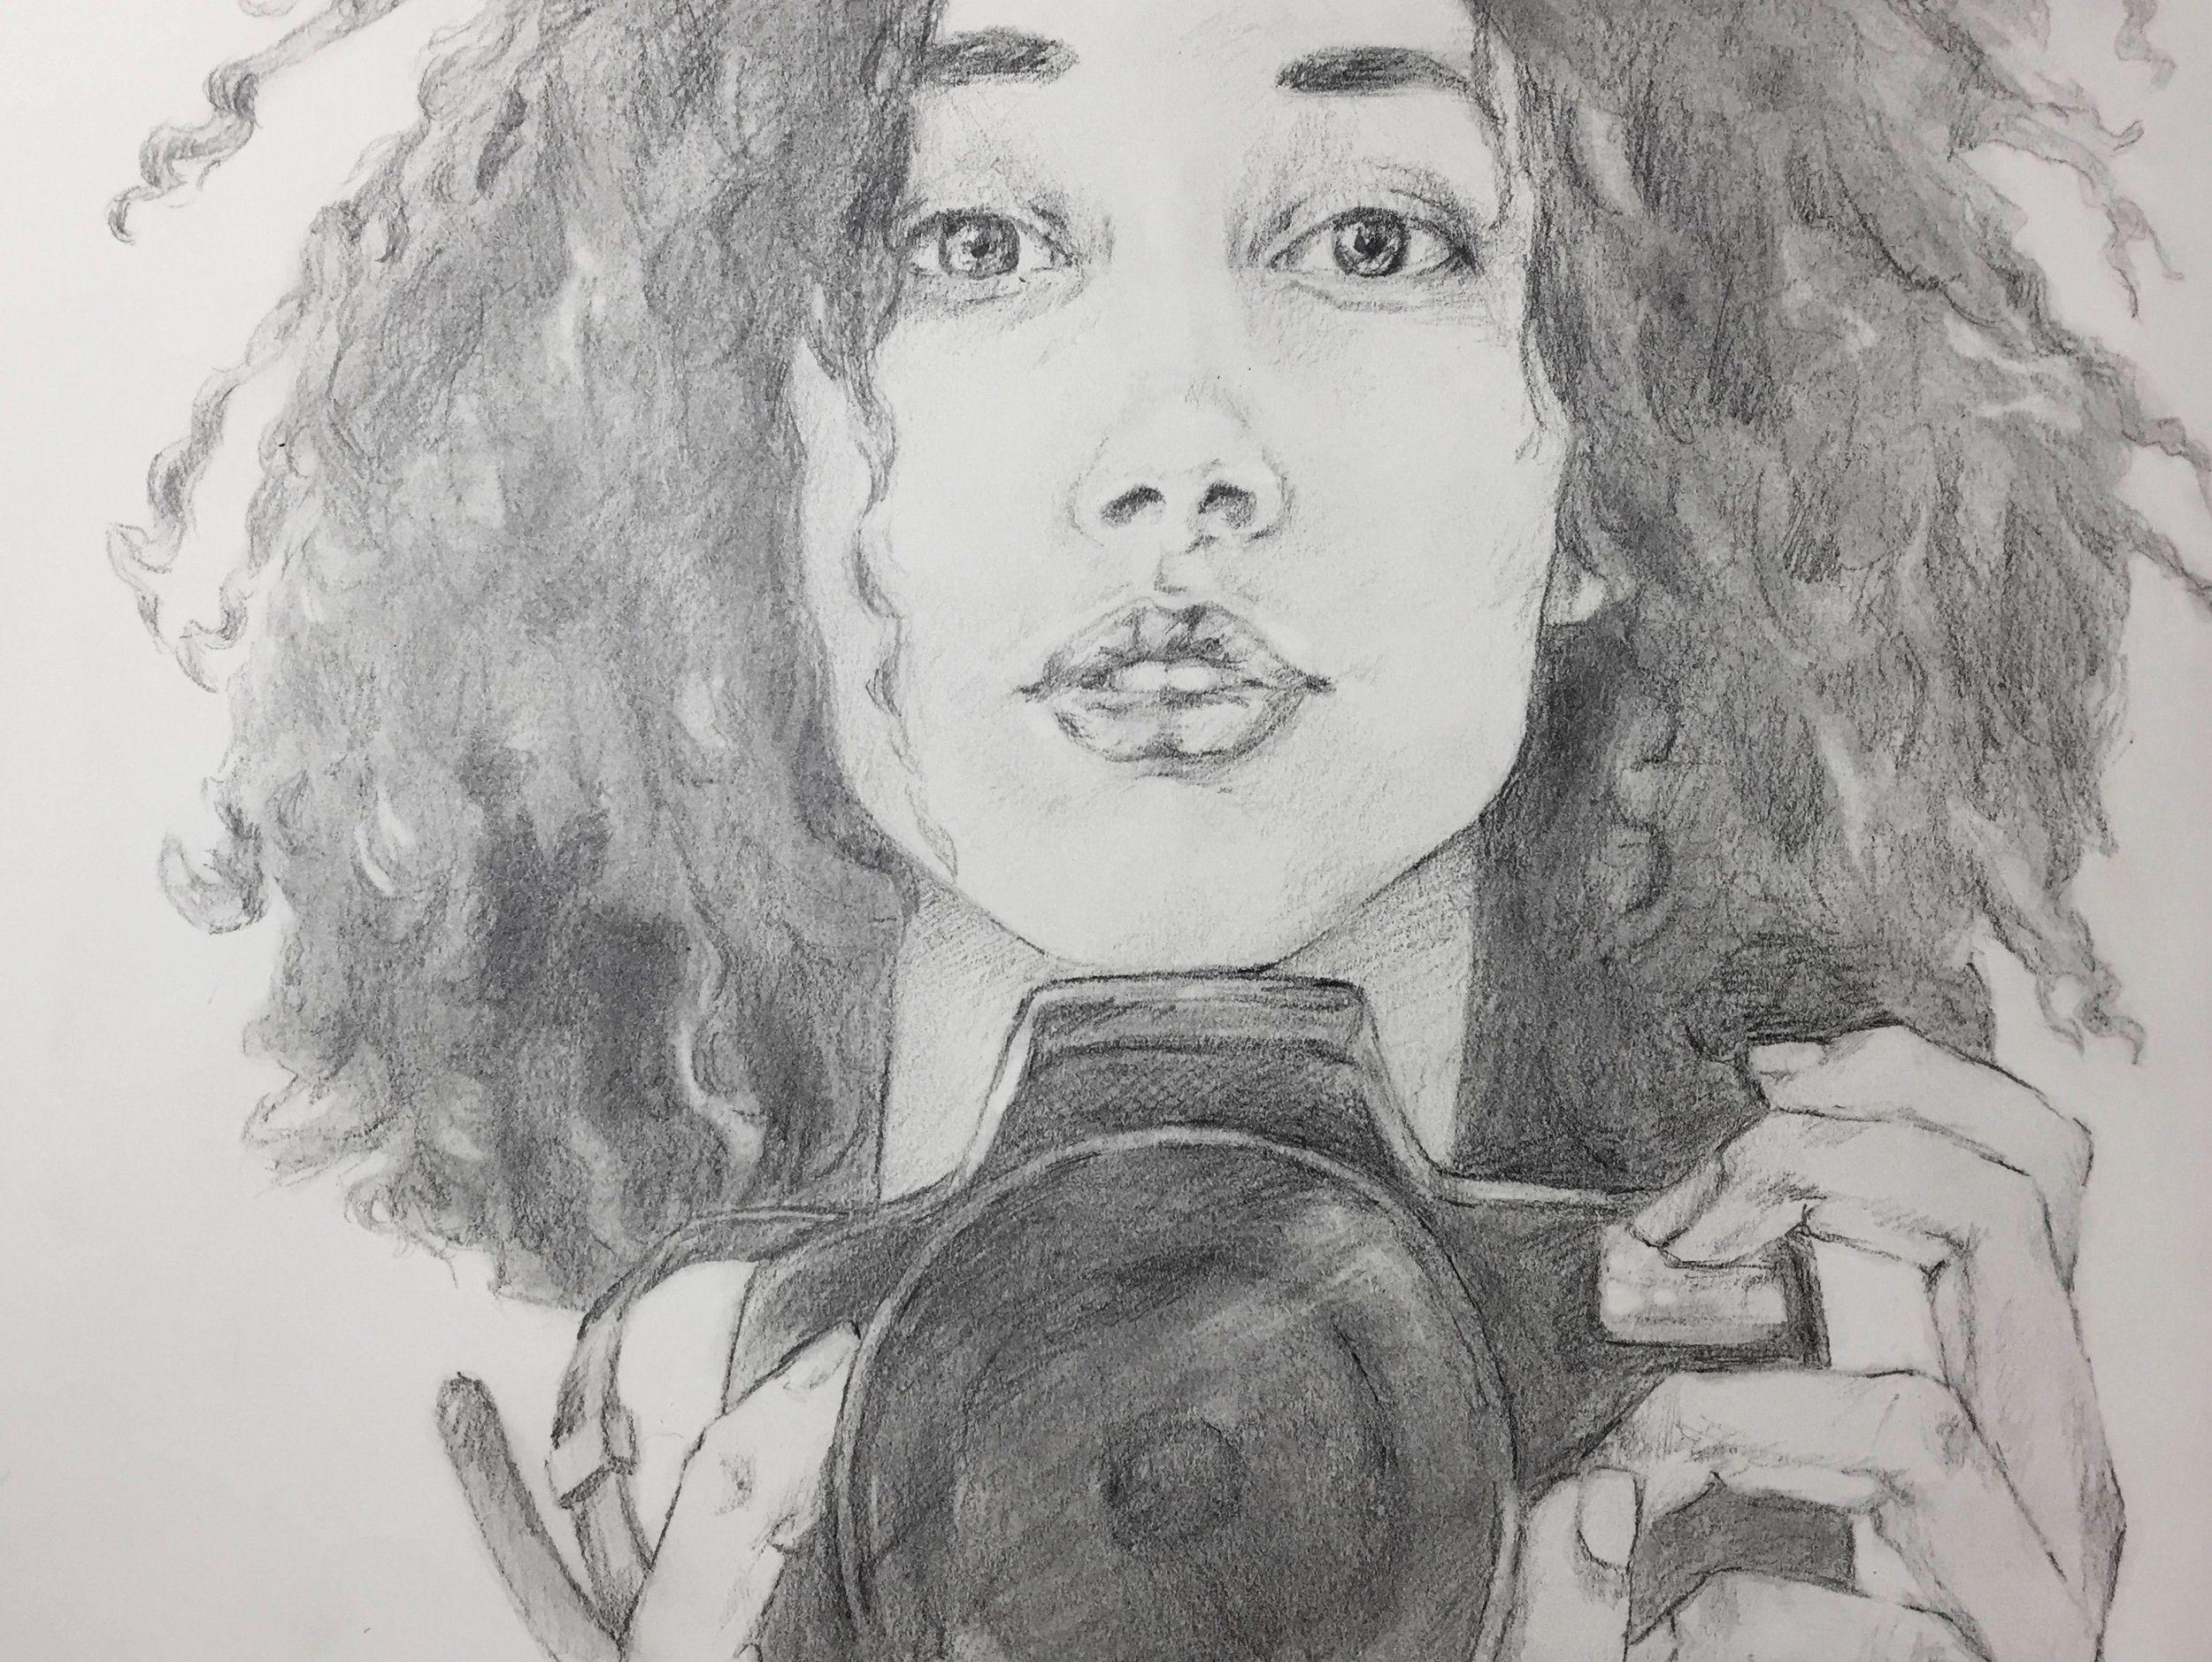 Sktchy30 presenting art pencil drawing portrait art photography woman artwork fine art